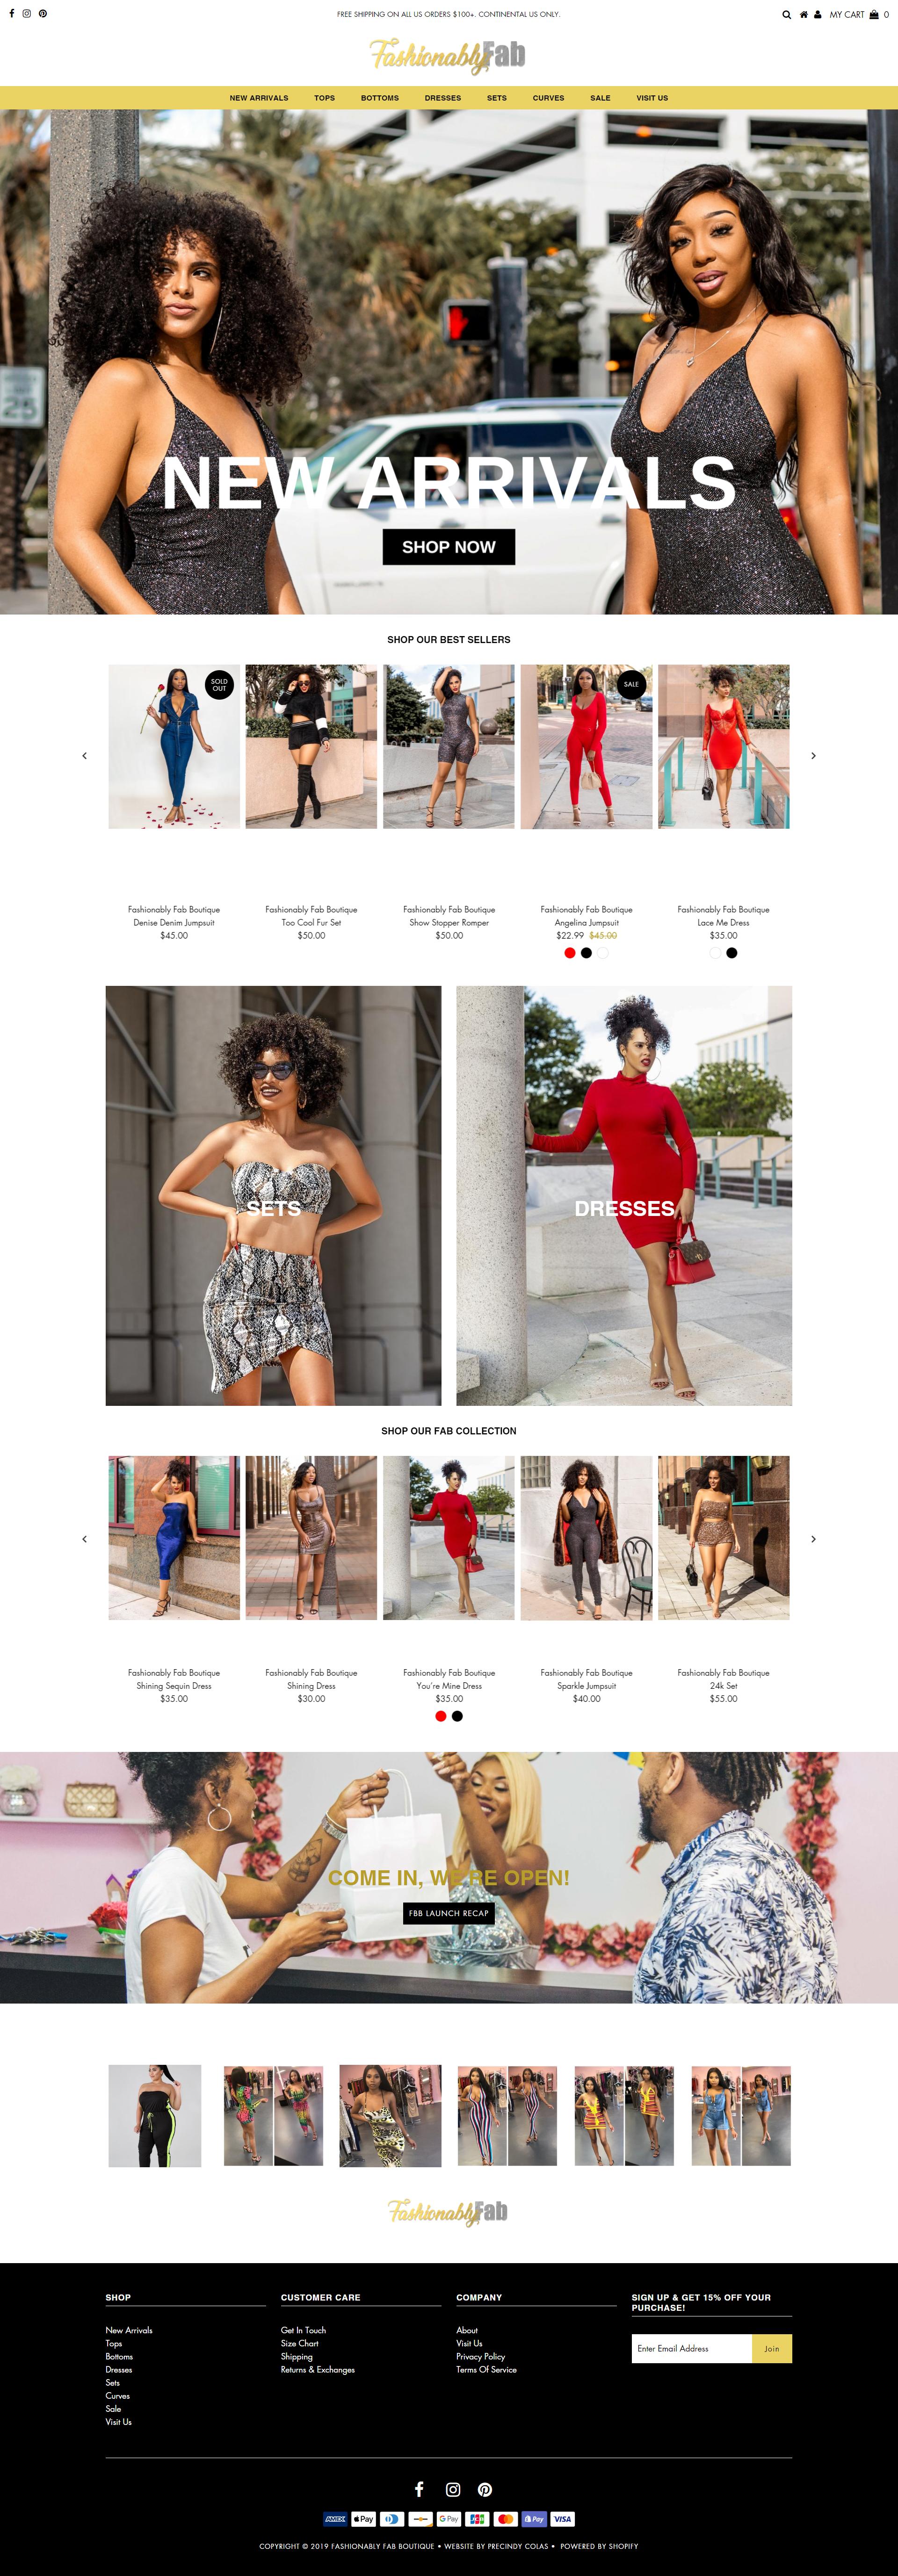 precindy-colas-fashionably-fab-boutique-homepage-.png